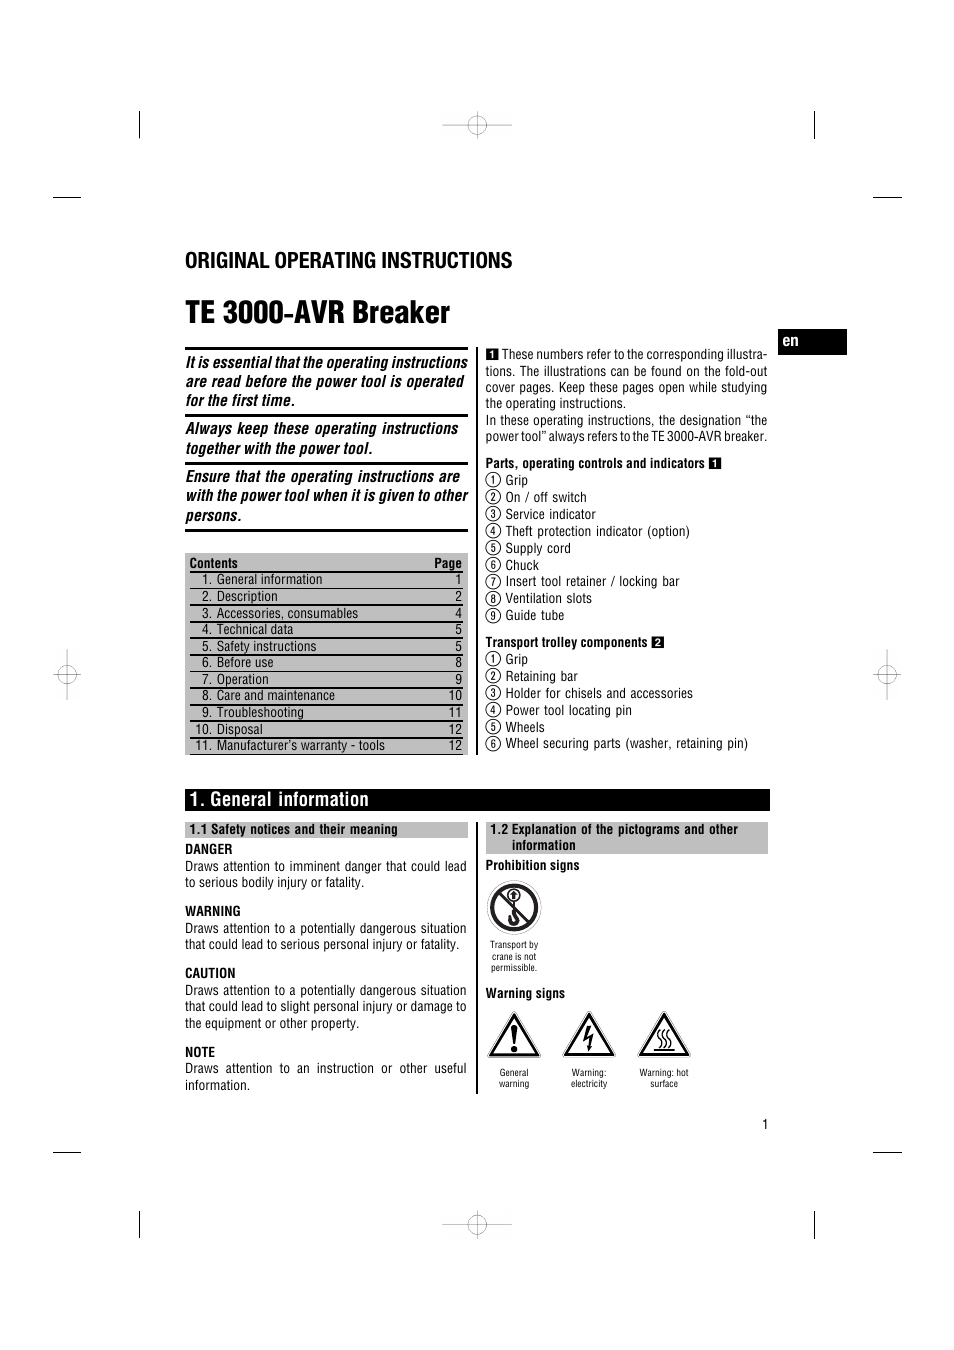 Te 3000 ‑ avr breaker, Original operating instructions